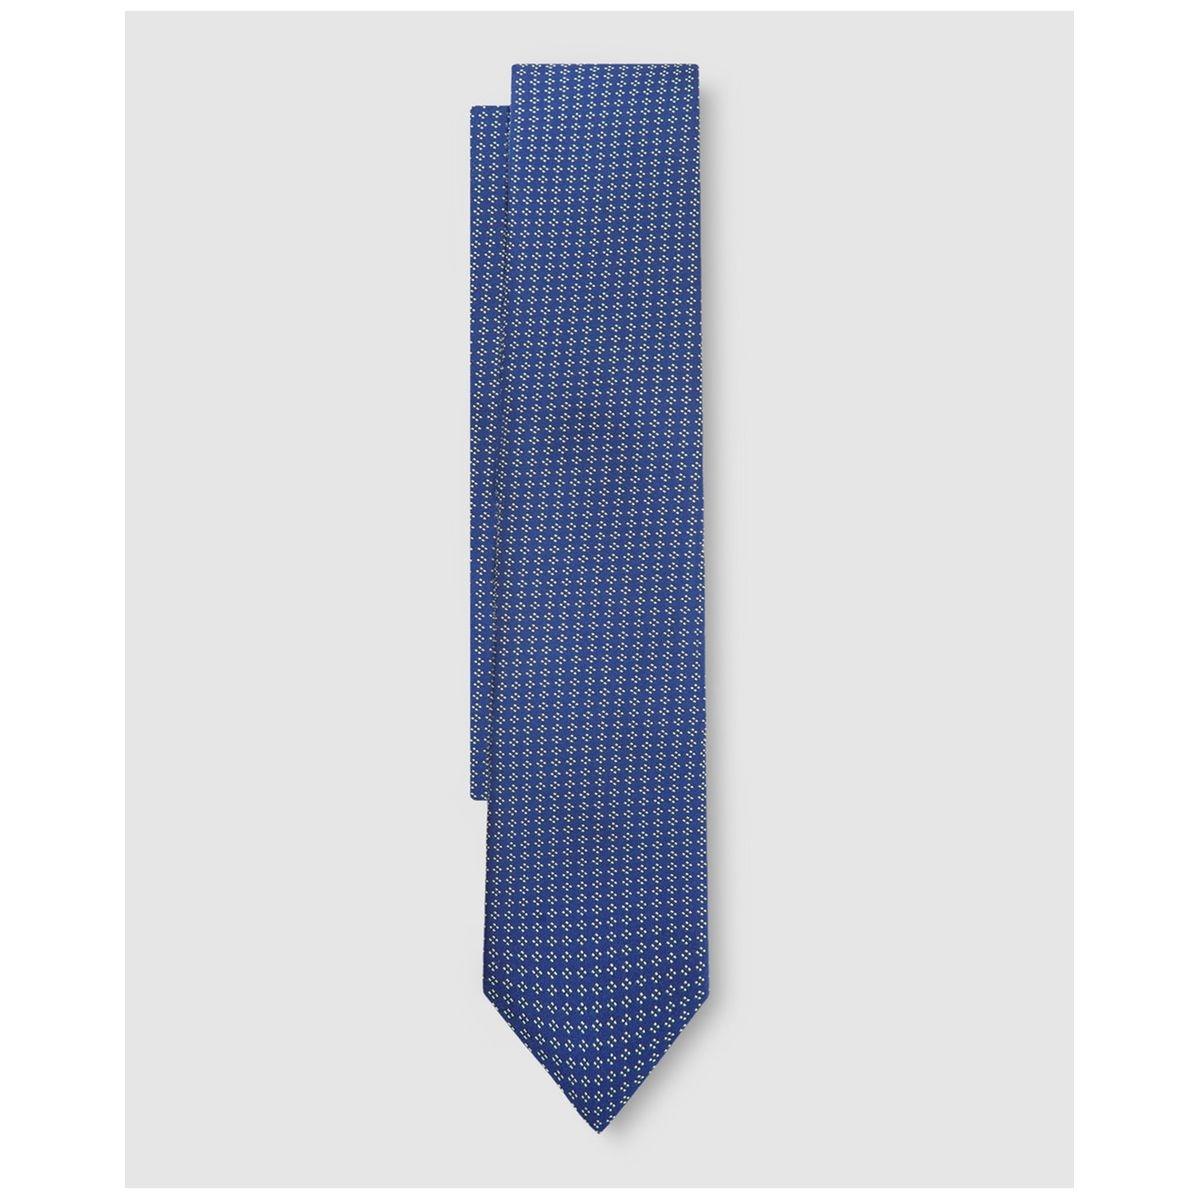 Cravate unie à jacquard fantaisie